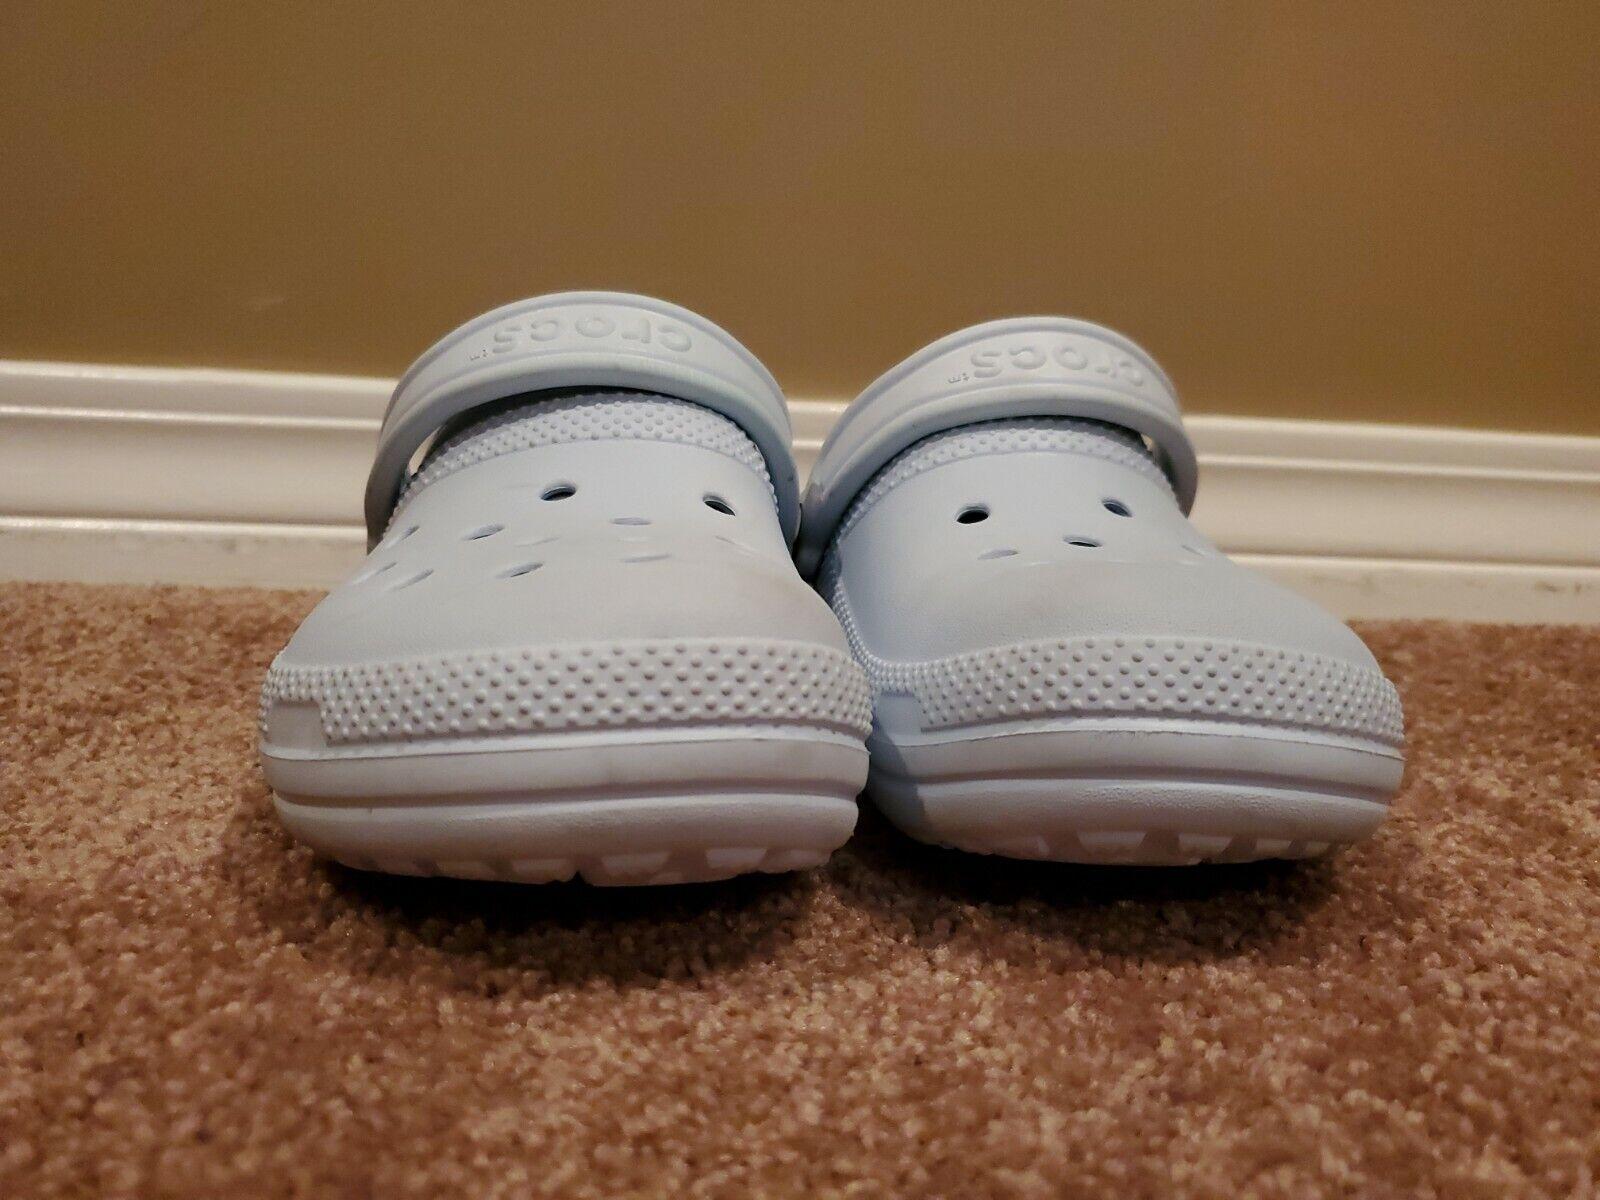 Womens Crocs Lined Size 6 Light Blue Great Used Shape